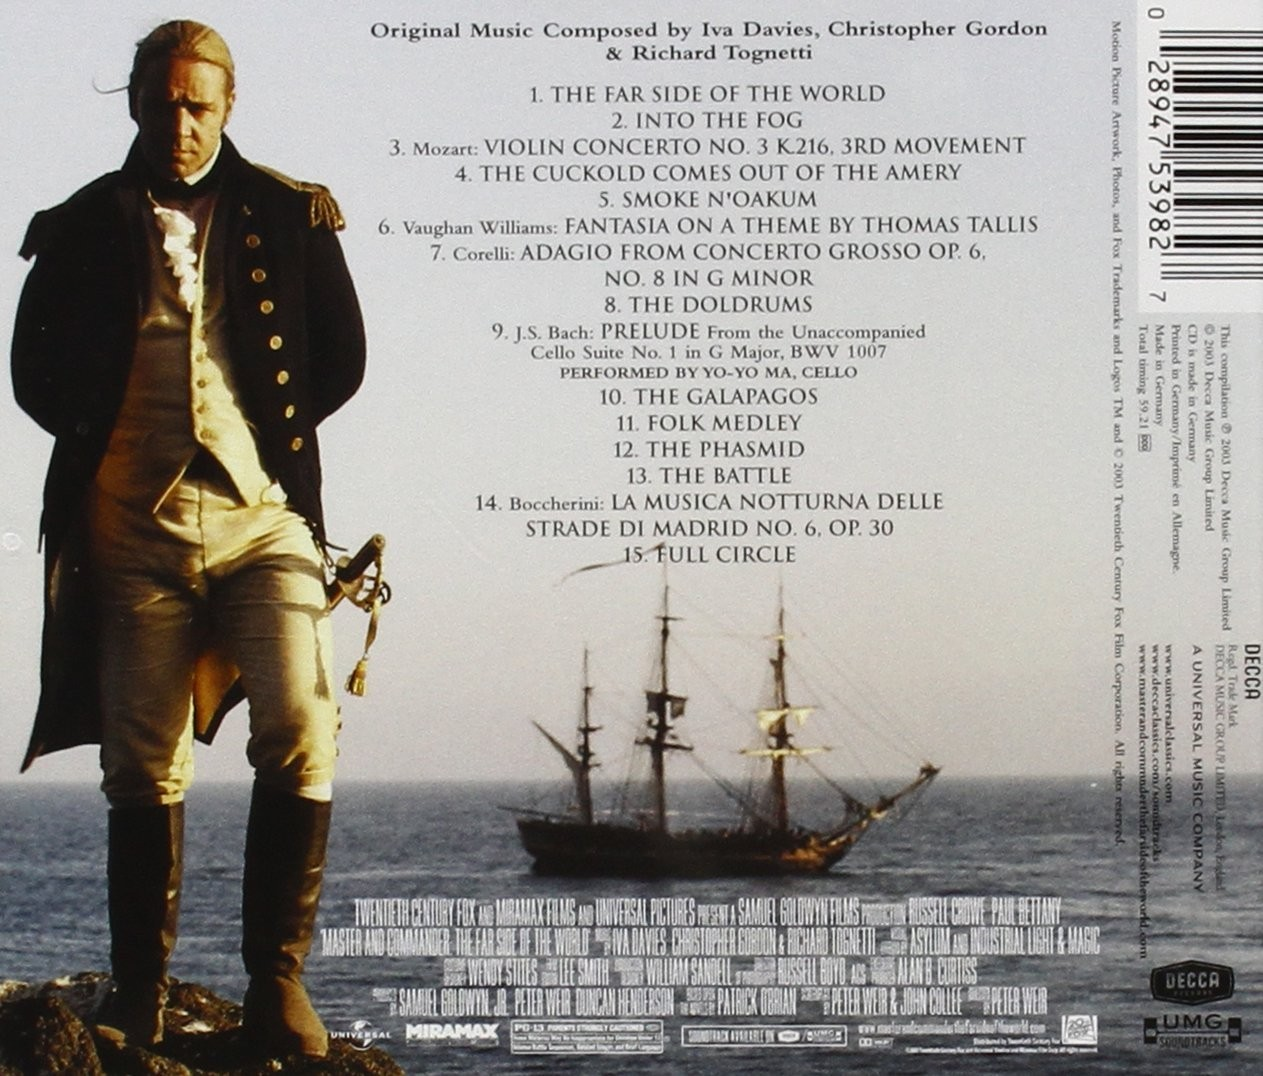 Download movie music site video